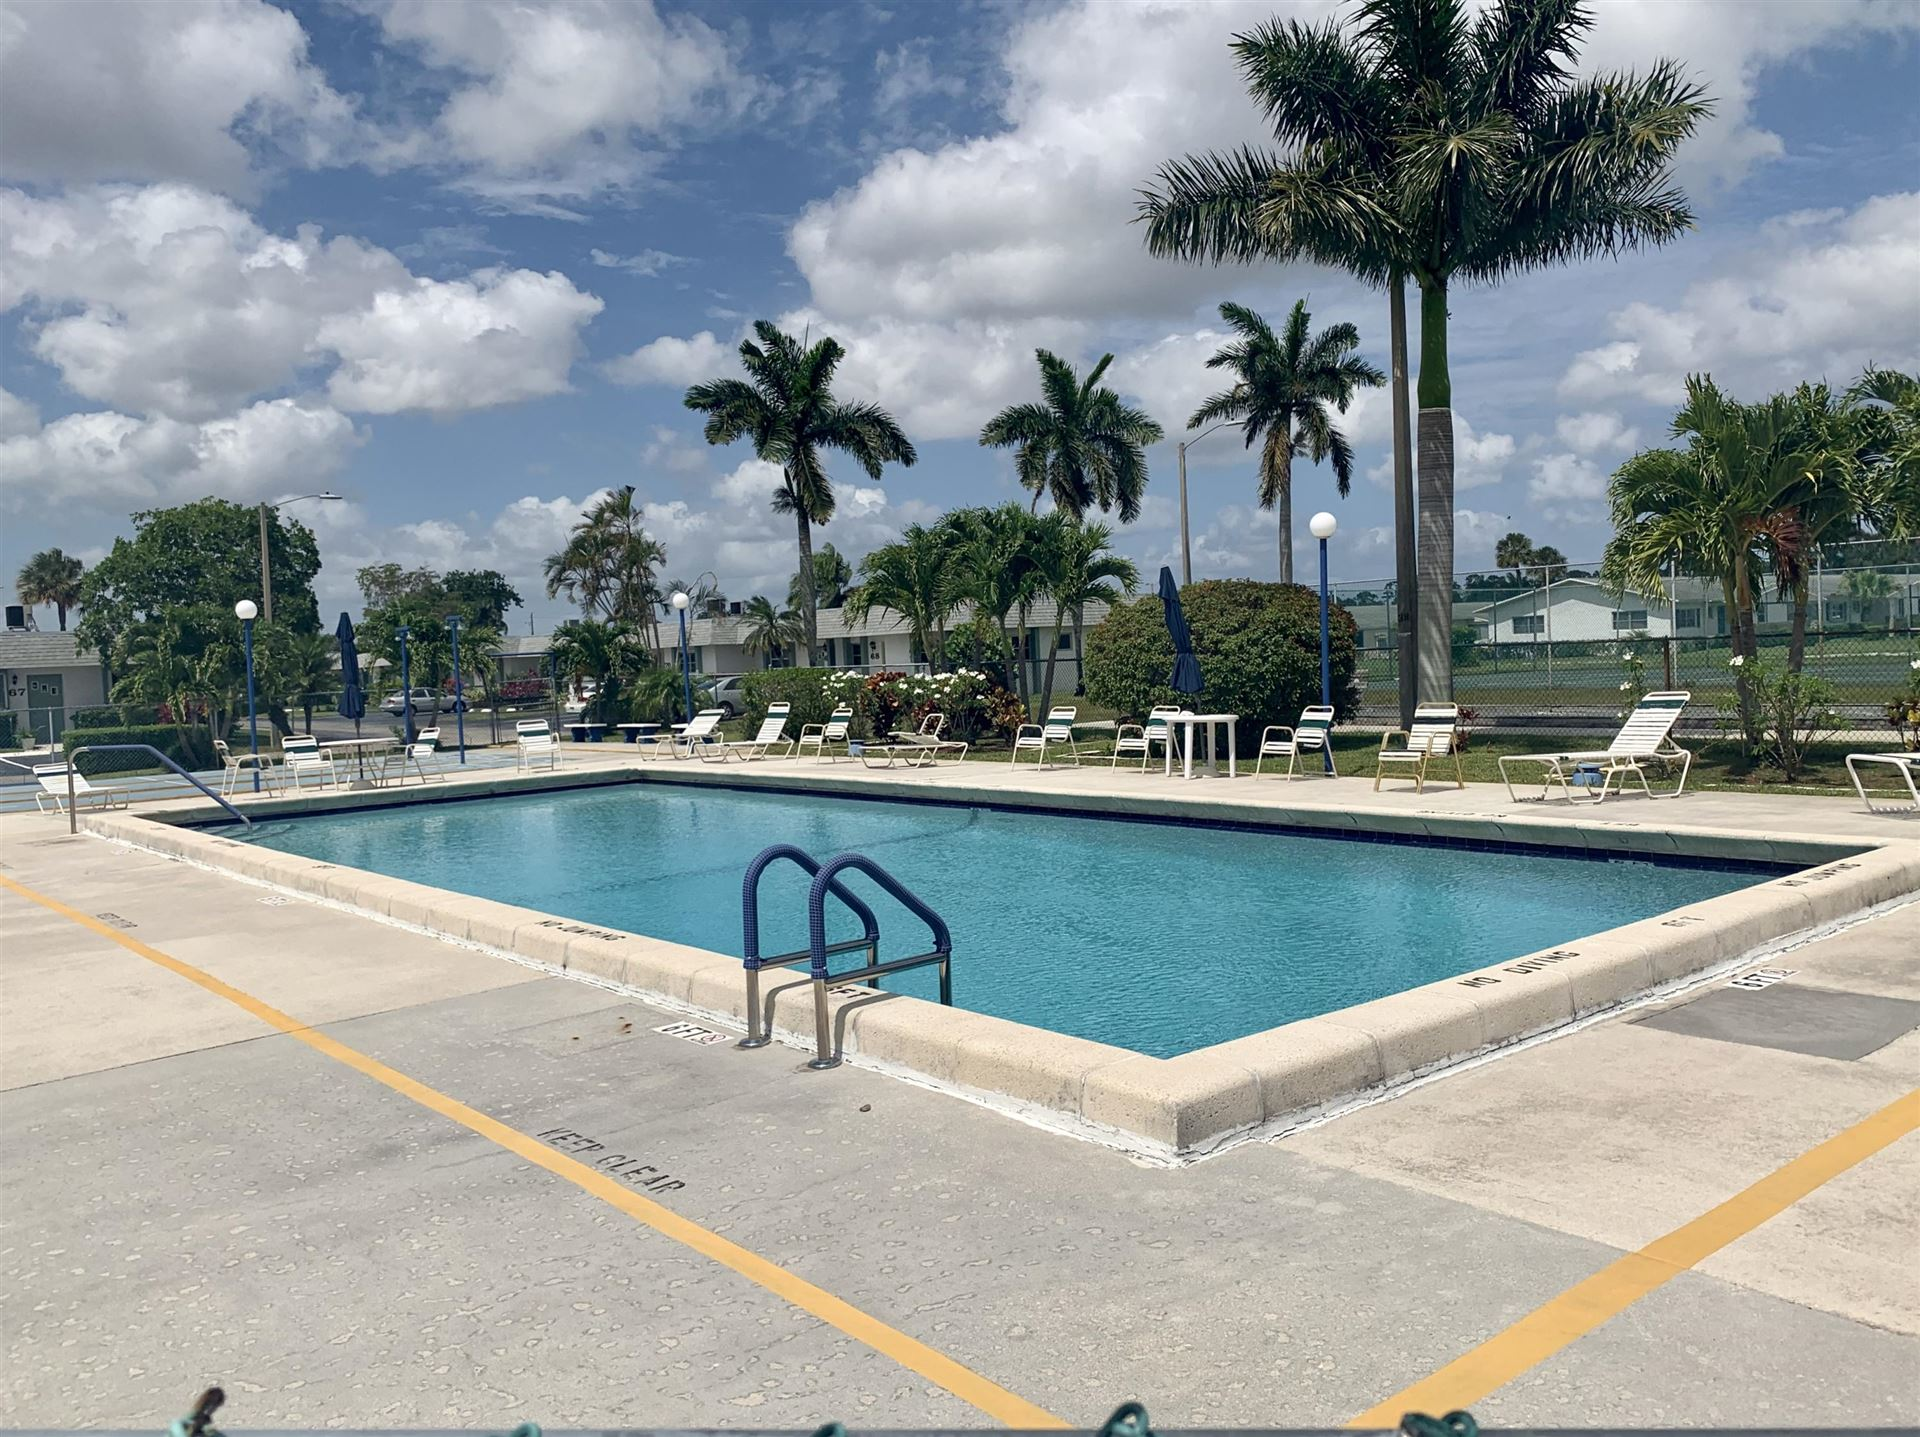 2638 Gately Drive E #16, West Palm Beach, FL 33415 - #: RX-10606628